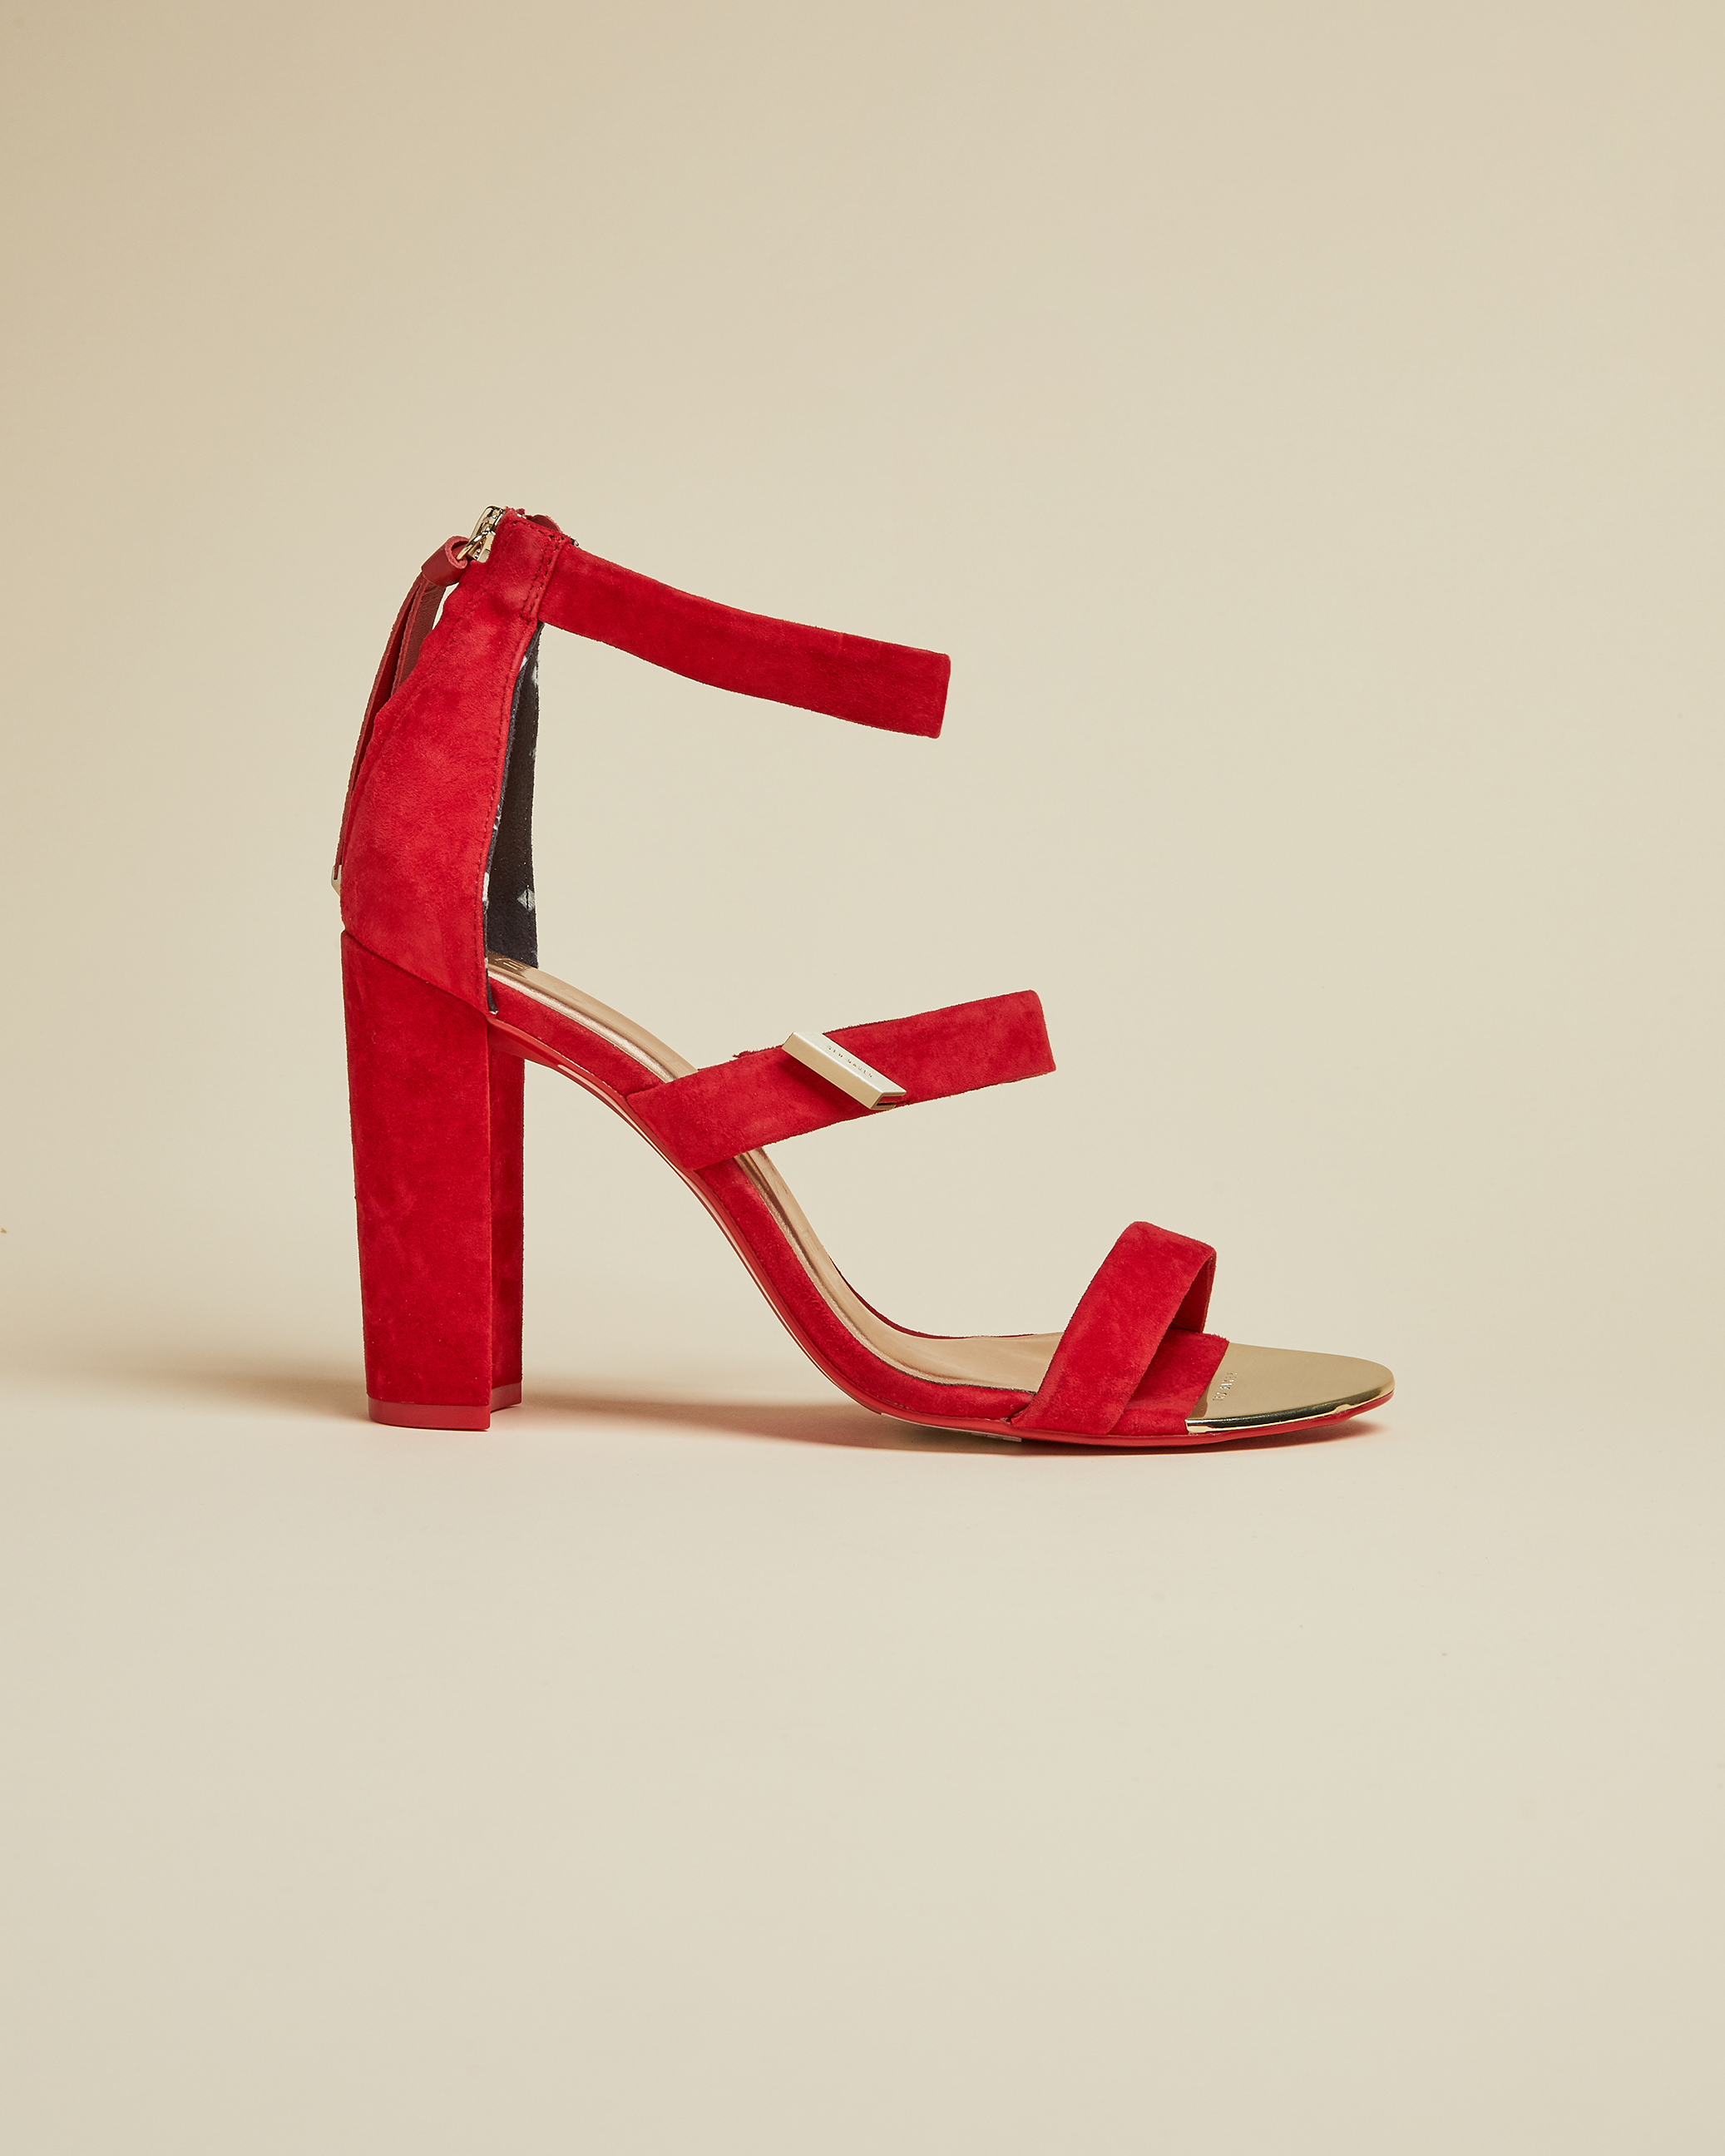 Details about  /Ted Baker Women/'s Raidha Heeled Sandal